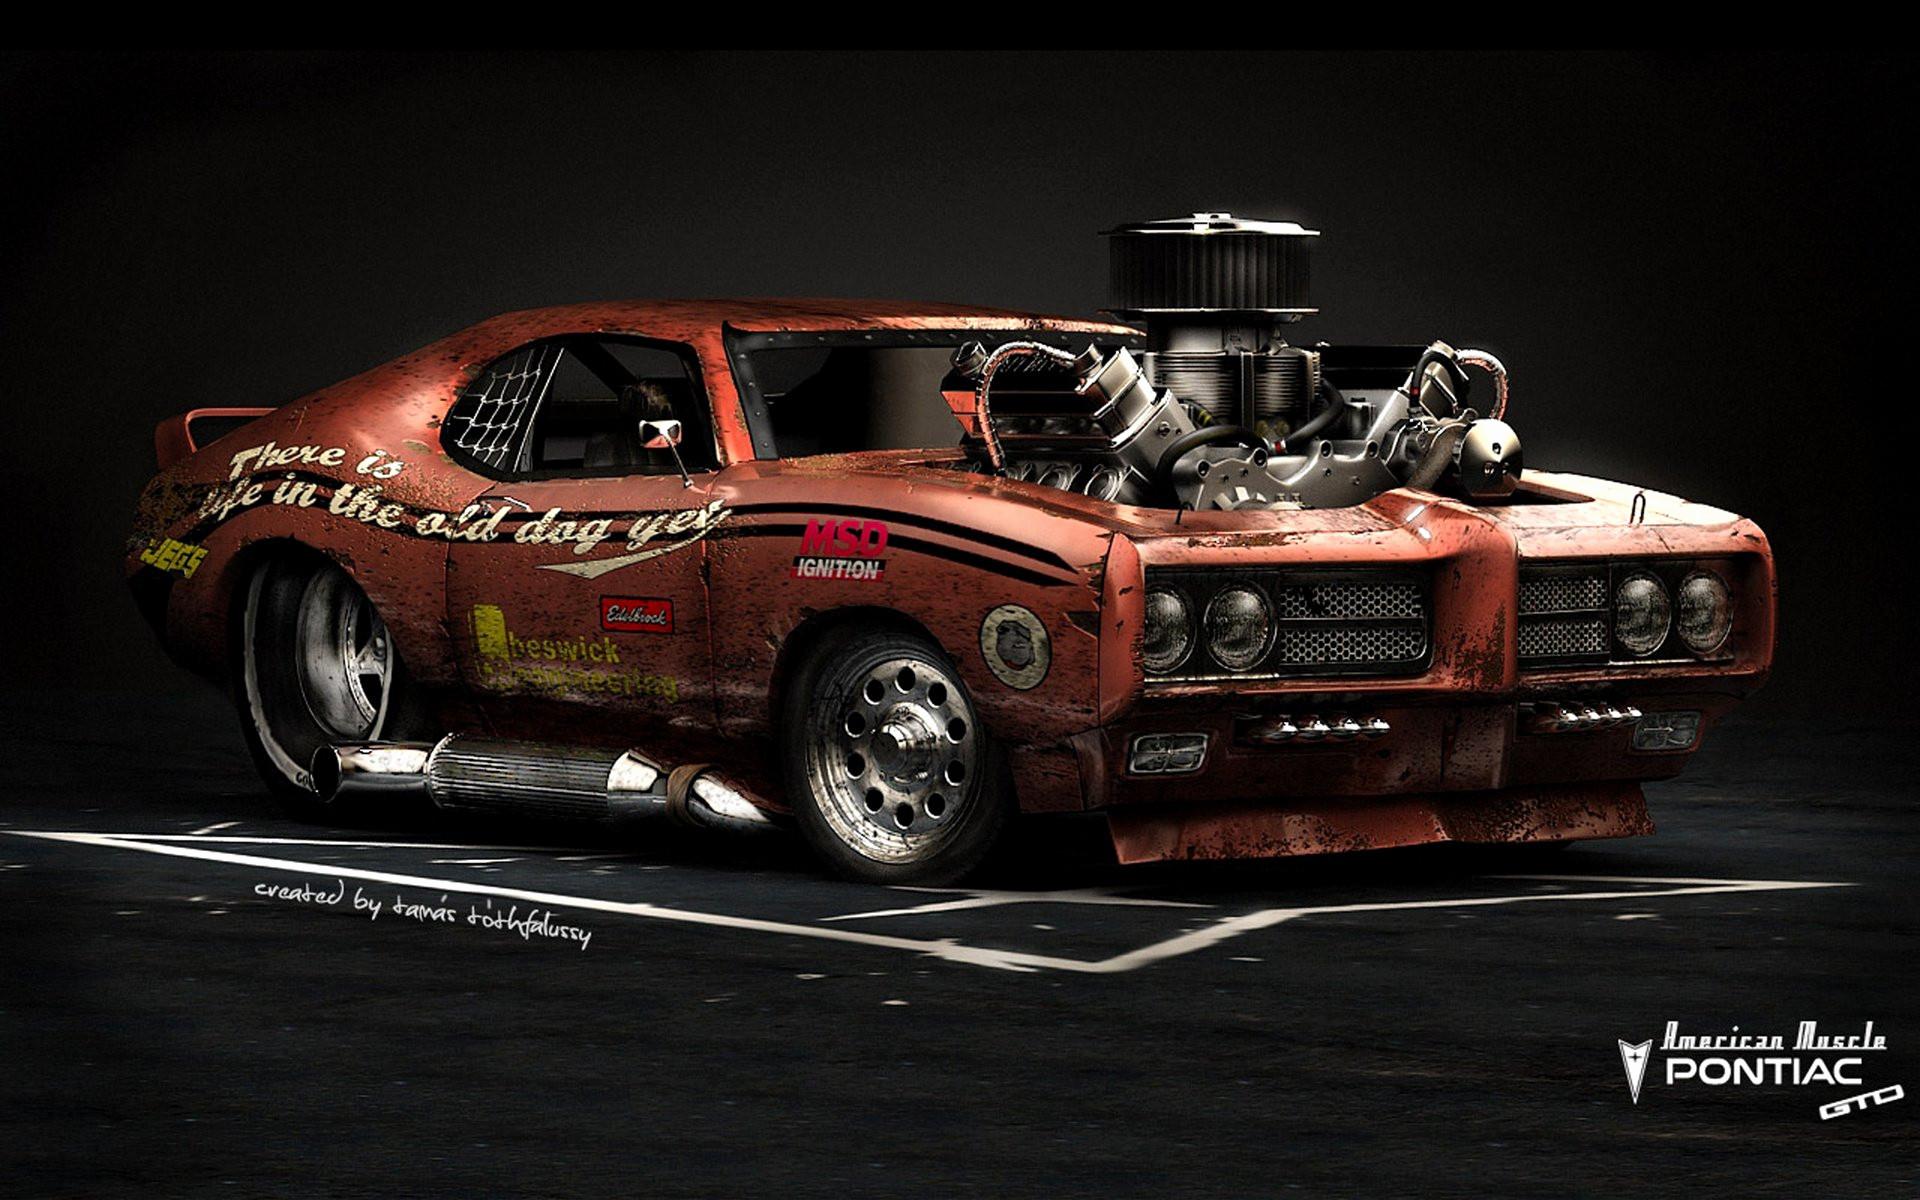 1920x1080 Hd Car Photos, Tuning, Amazing Autos, Desktop Images, Background  Photos, Speedy Vehicles, Windows Car Wallpapers, Download, 1920Ãu20141080  Wallpaper ...